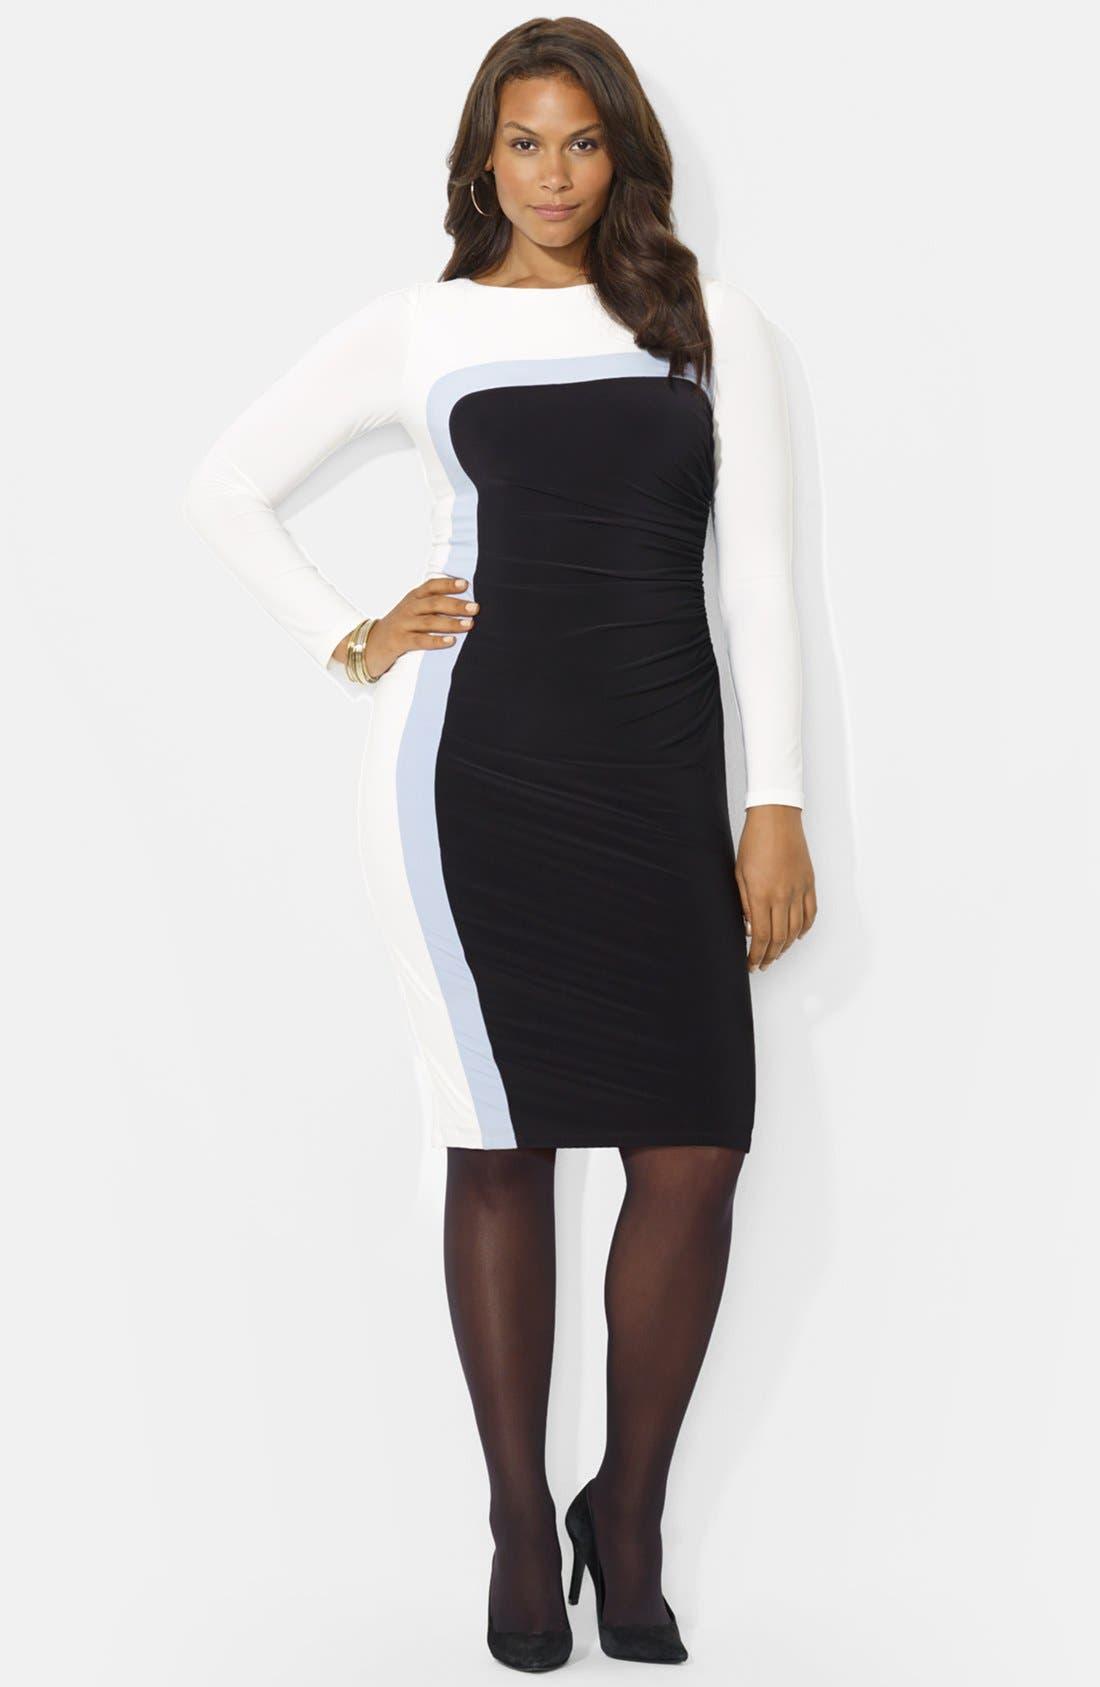 Alternate Image 1 Selected - Lauren Ralph Lauren Colorblock Jersey Sheath Dress (Plus Size)